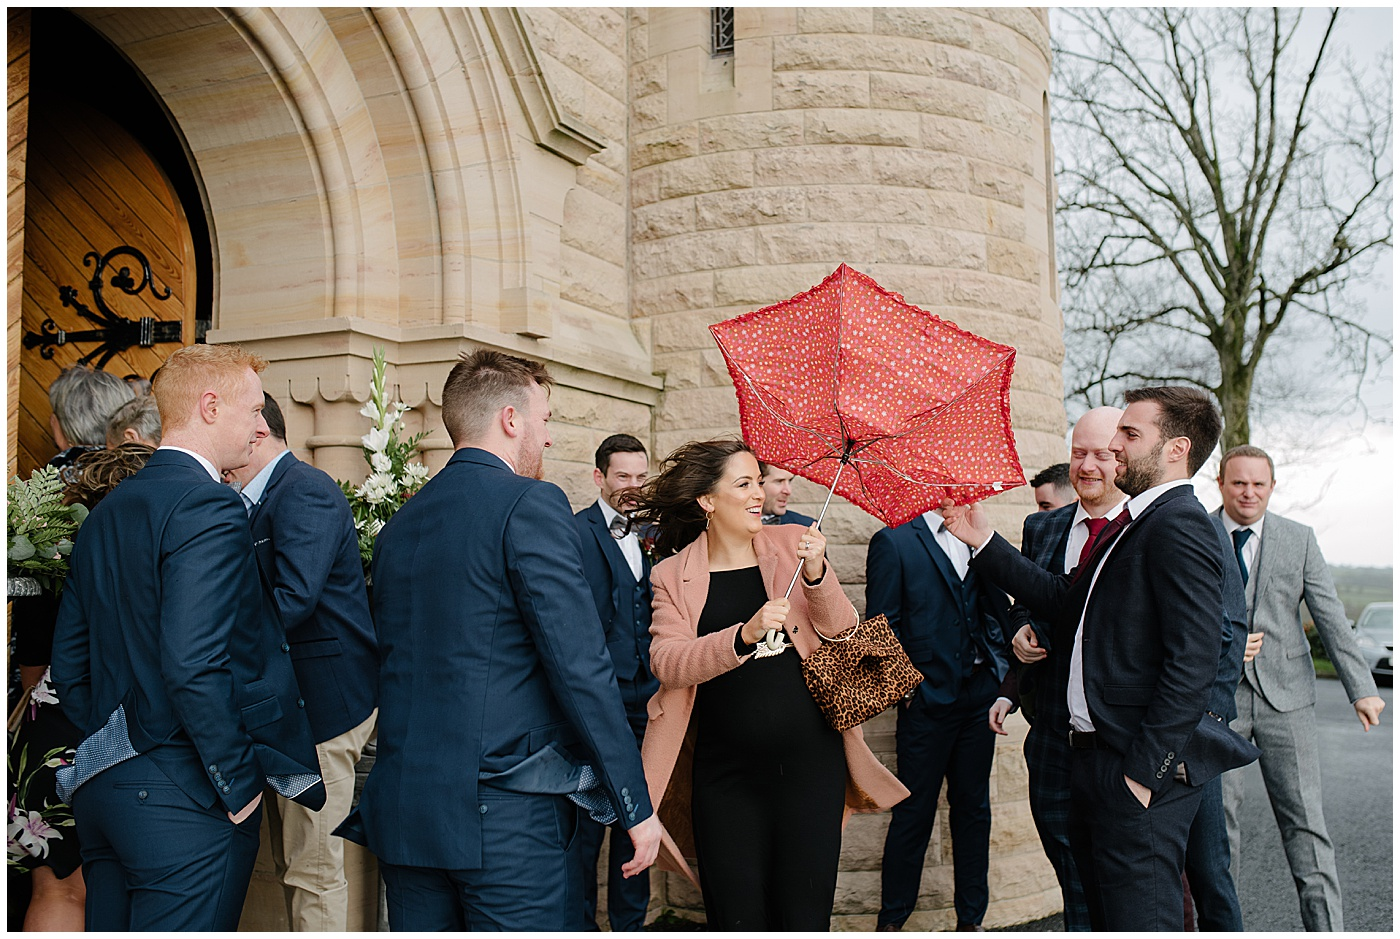 lissan-house-wedding-jude-browne-photography_0025.jpg